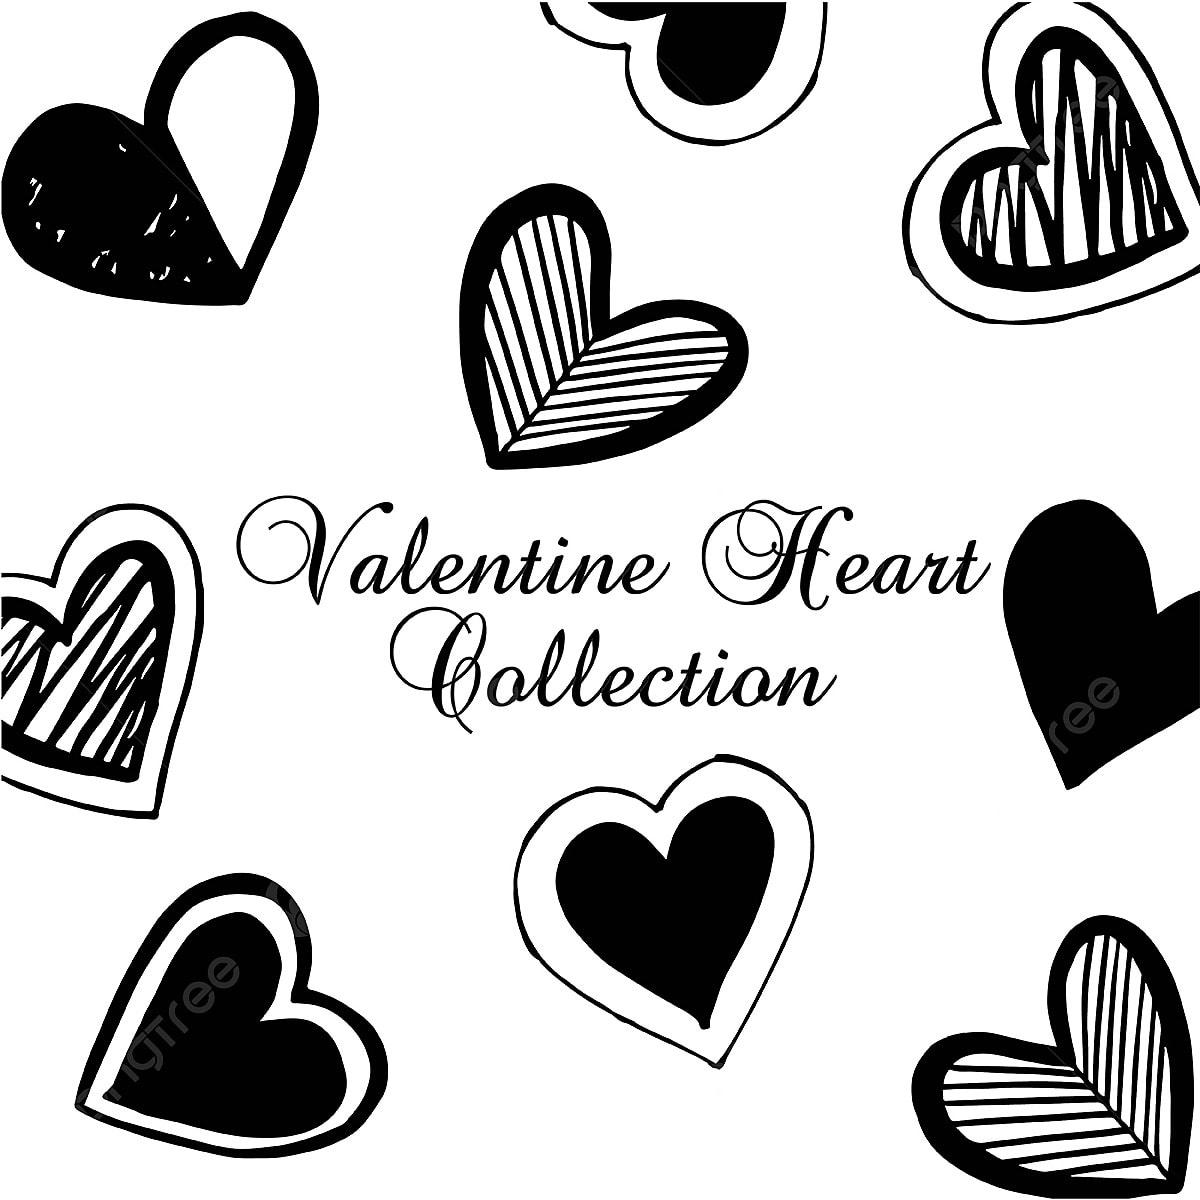 Hand Drawn Valentine Heart Collection Hand Drawn Handmade